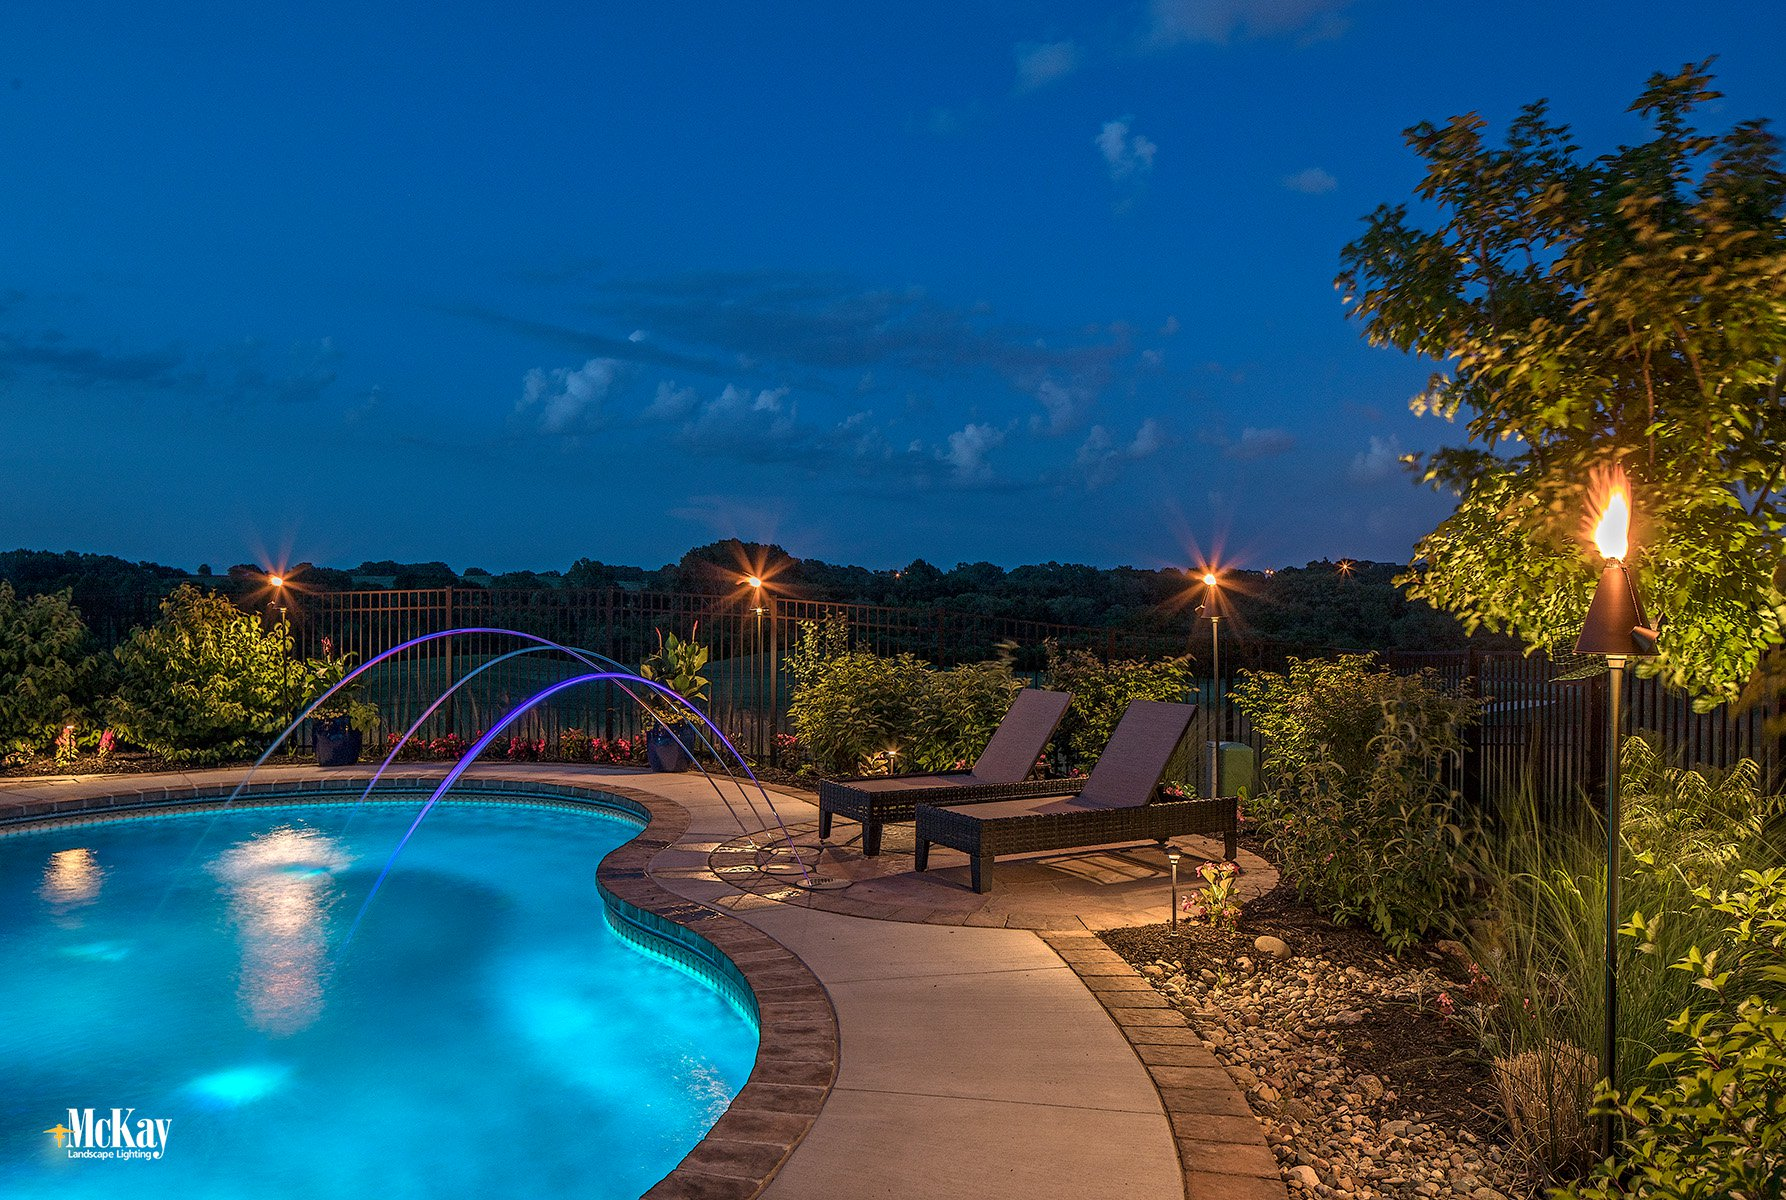 Residential Outdoor Pool Lighting Omaha Nebraska - McKay Landscape Lighting